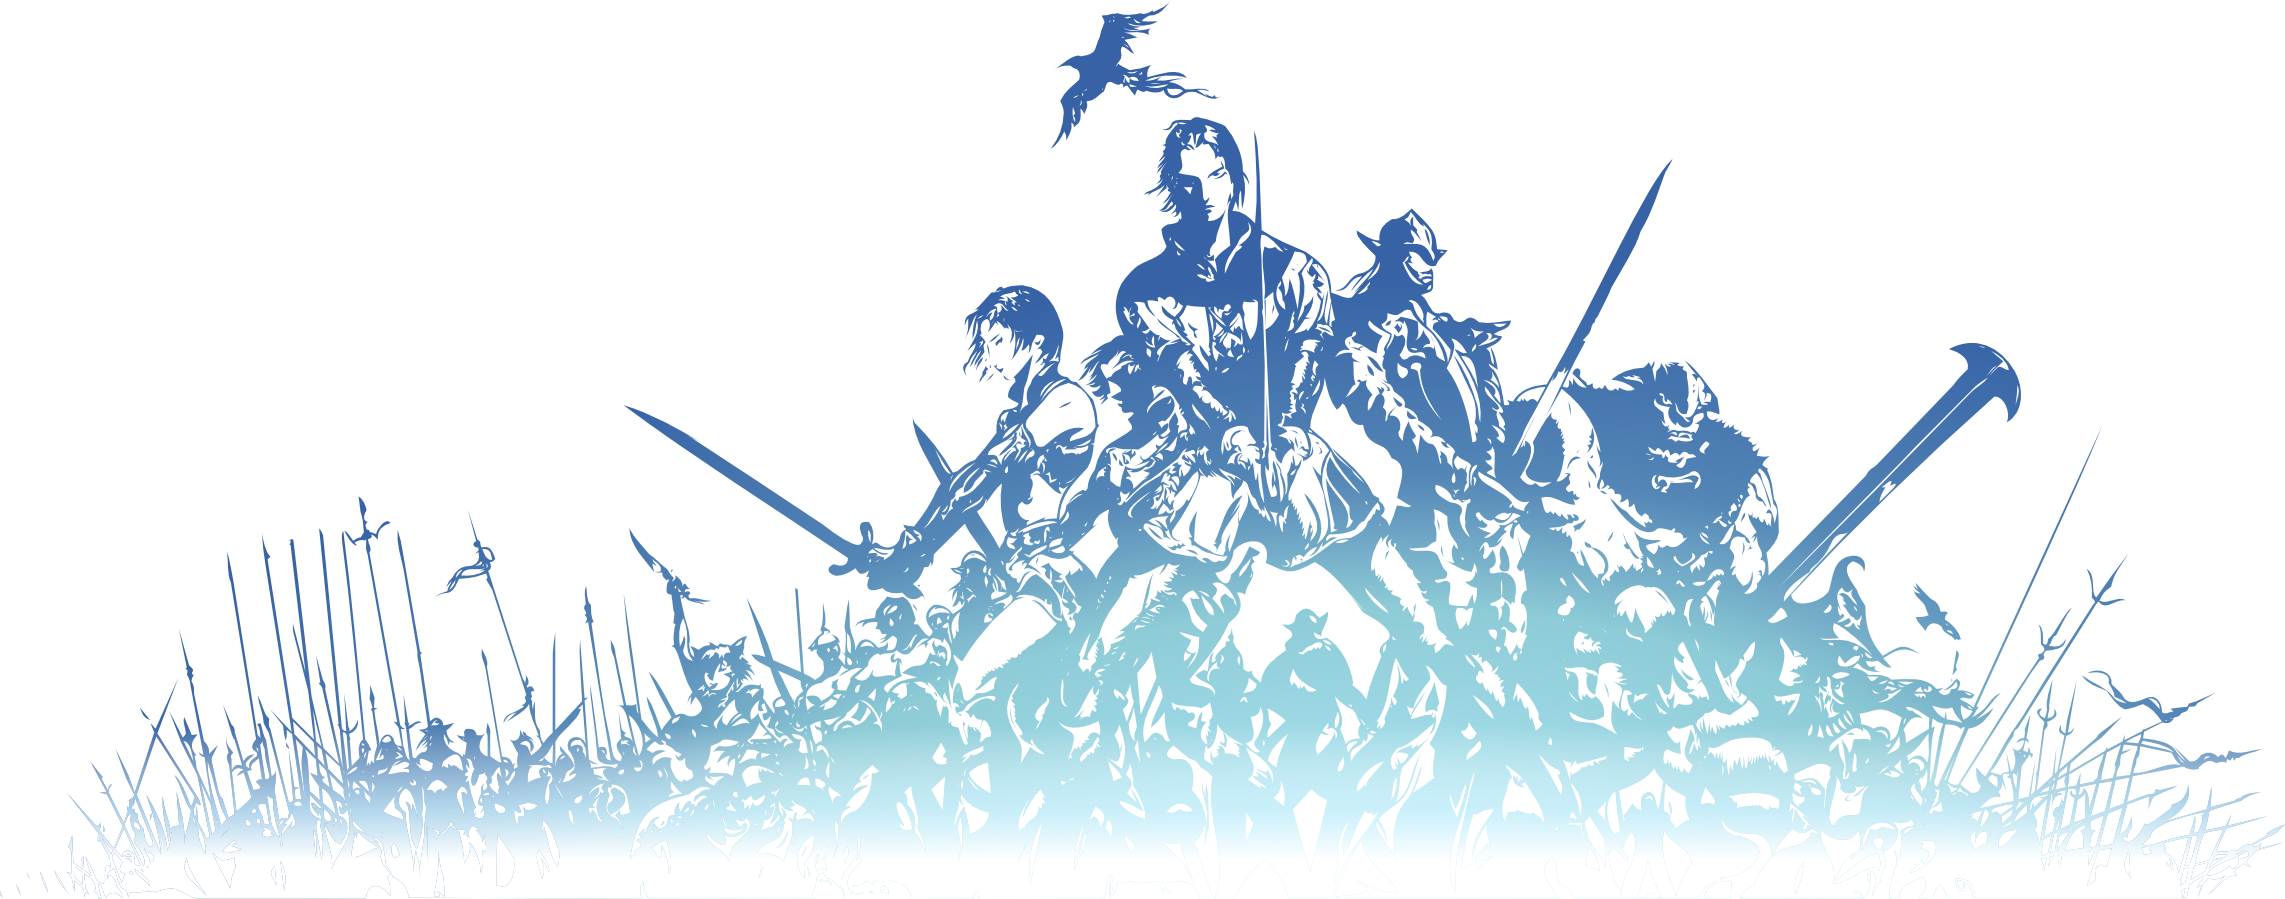 Final fantasy logo art - photo#36